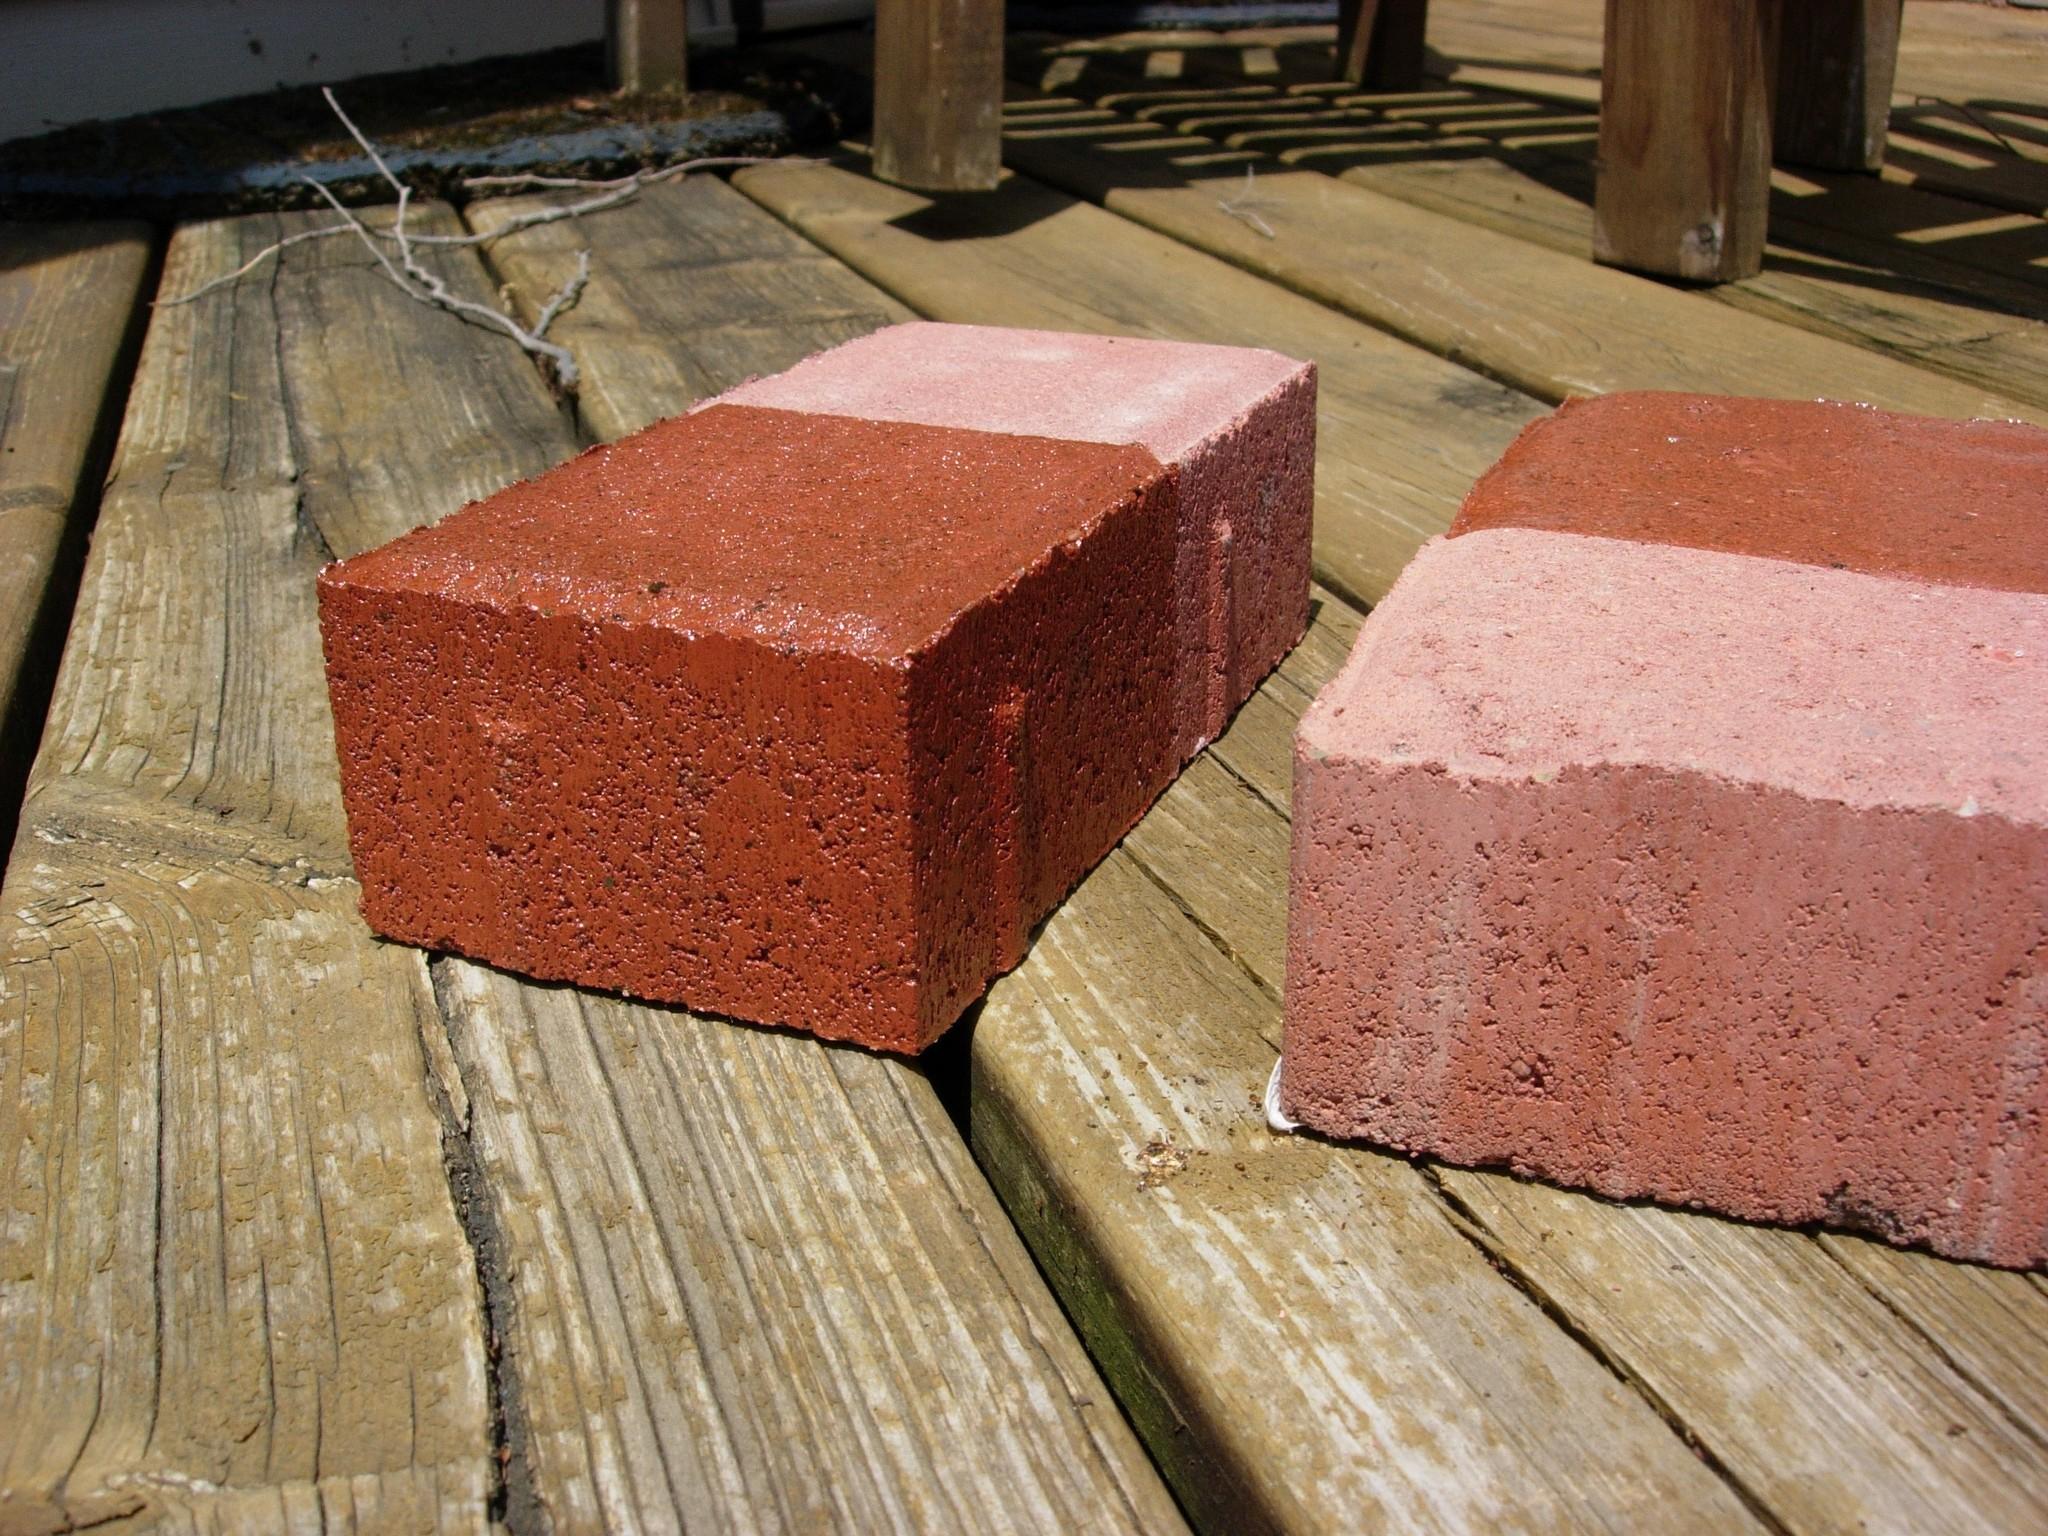 https://www.vseal.com/media/catalog/product/cache/1/image/9df78eab33525d08d6e5fb8d27136e95/P/i/Pic_Concrete_Paver_Red_Brick_Half_Sealed_IG-SB_2_2baa57d7-56de-4c23-af85-0053da917f3b.jpg